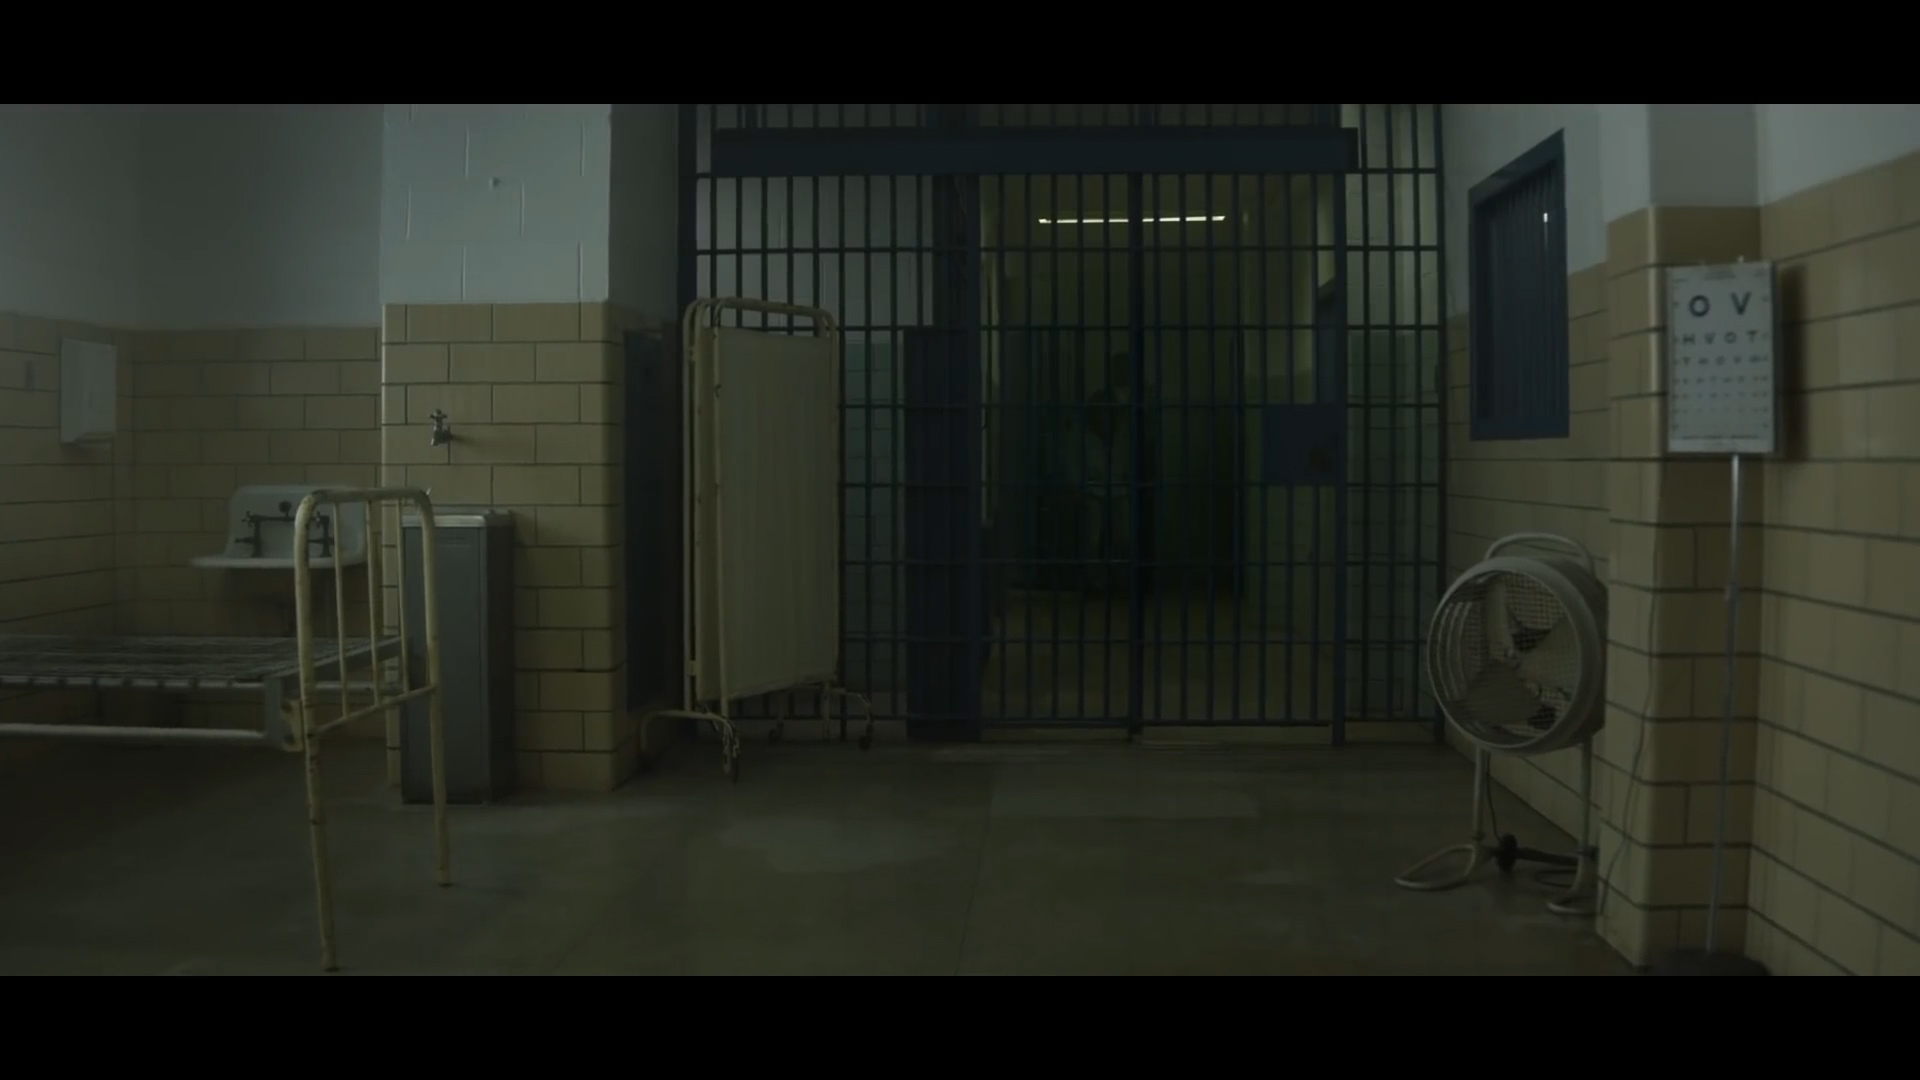 [2] Mindhunter Season 2 Official Trailer